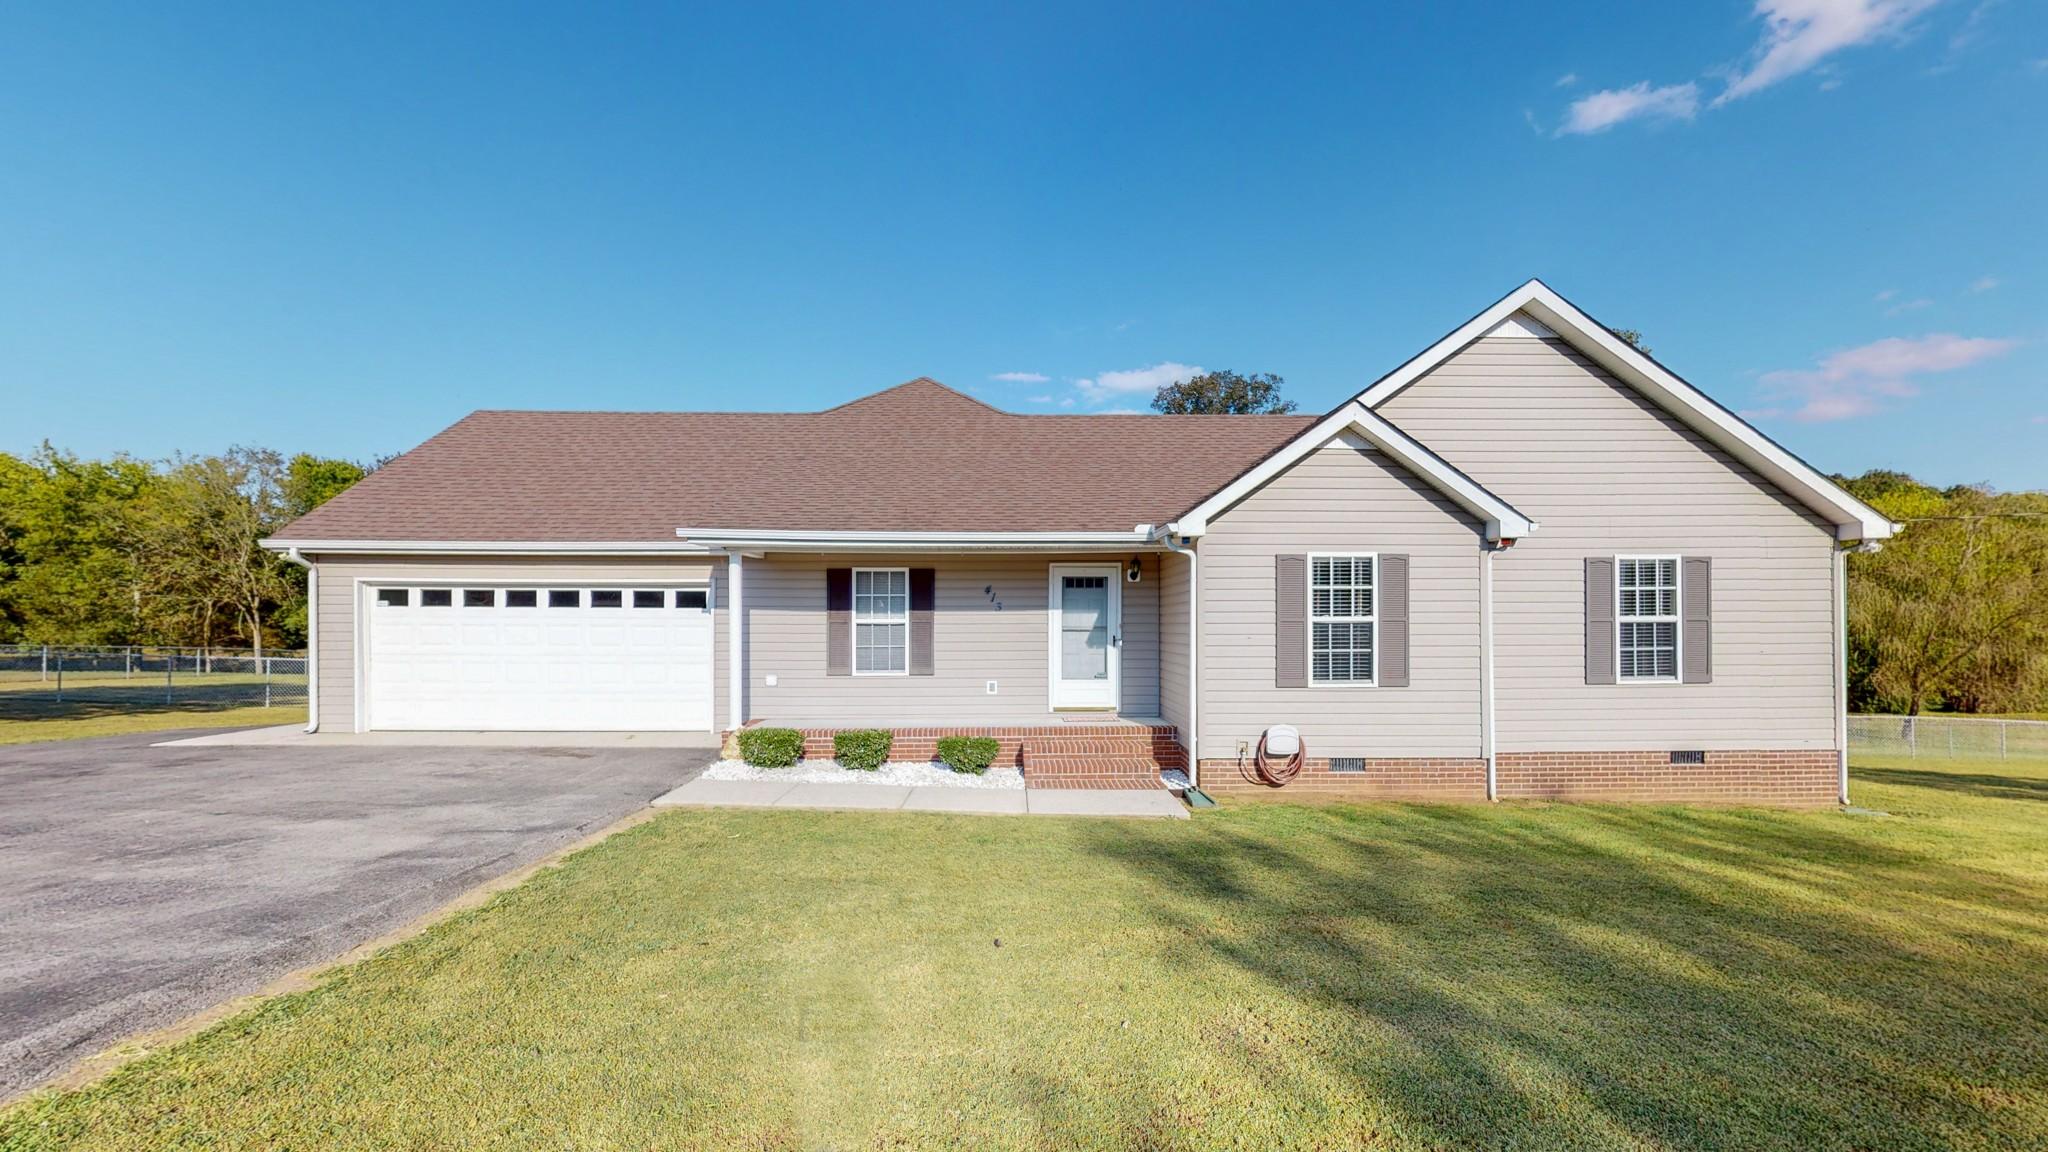 413 Bankshire Rd Property Photo - Beechgrove, TN real estate listing